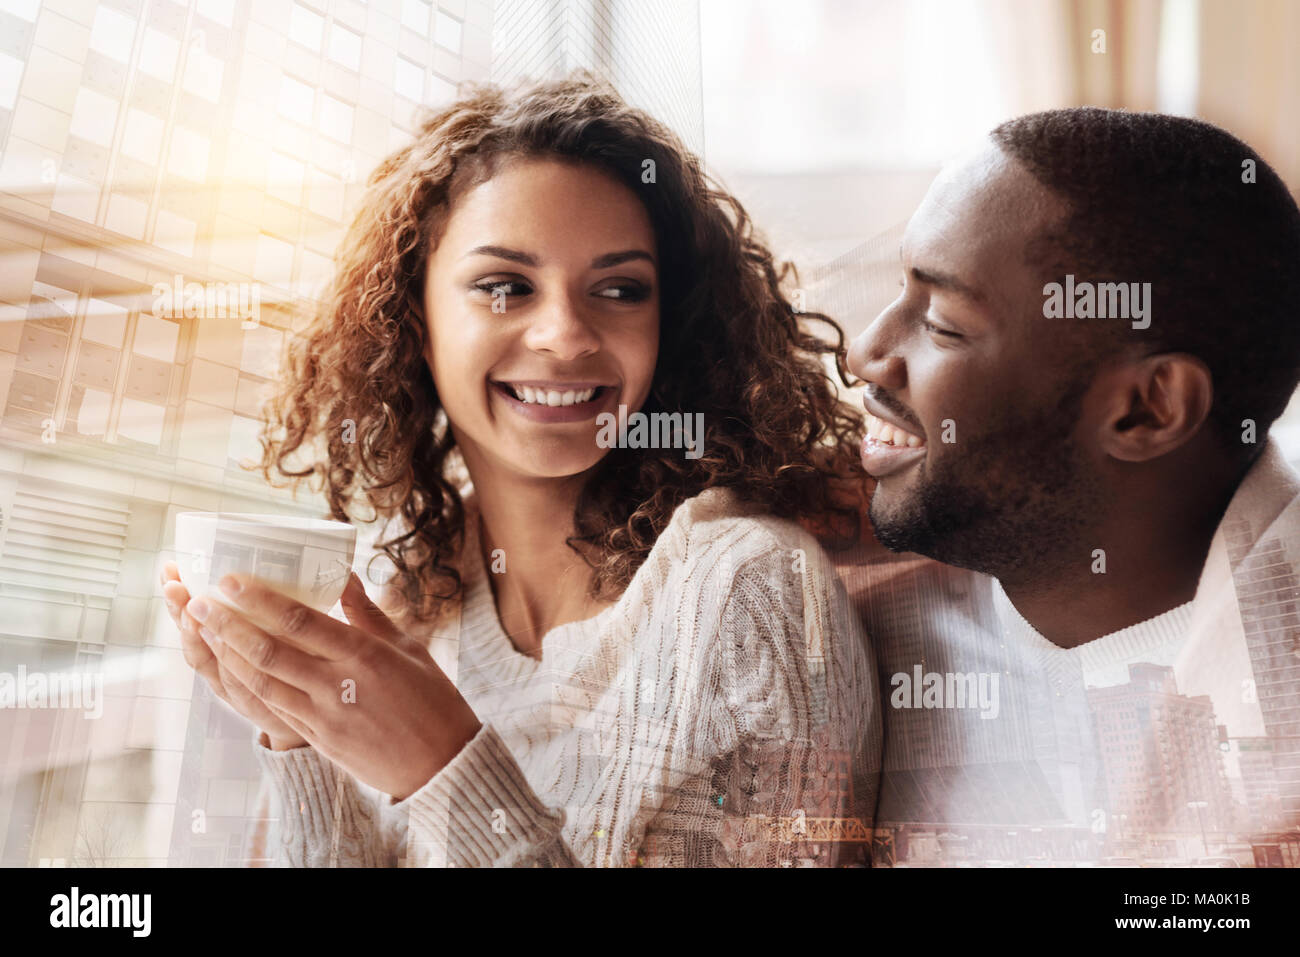 Positive couple enjoying being together - Stock Image